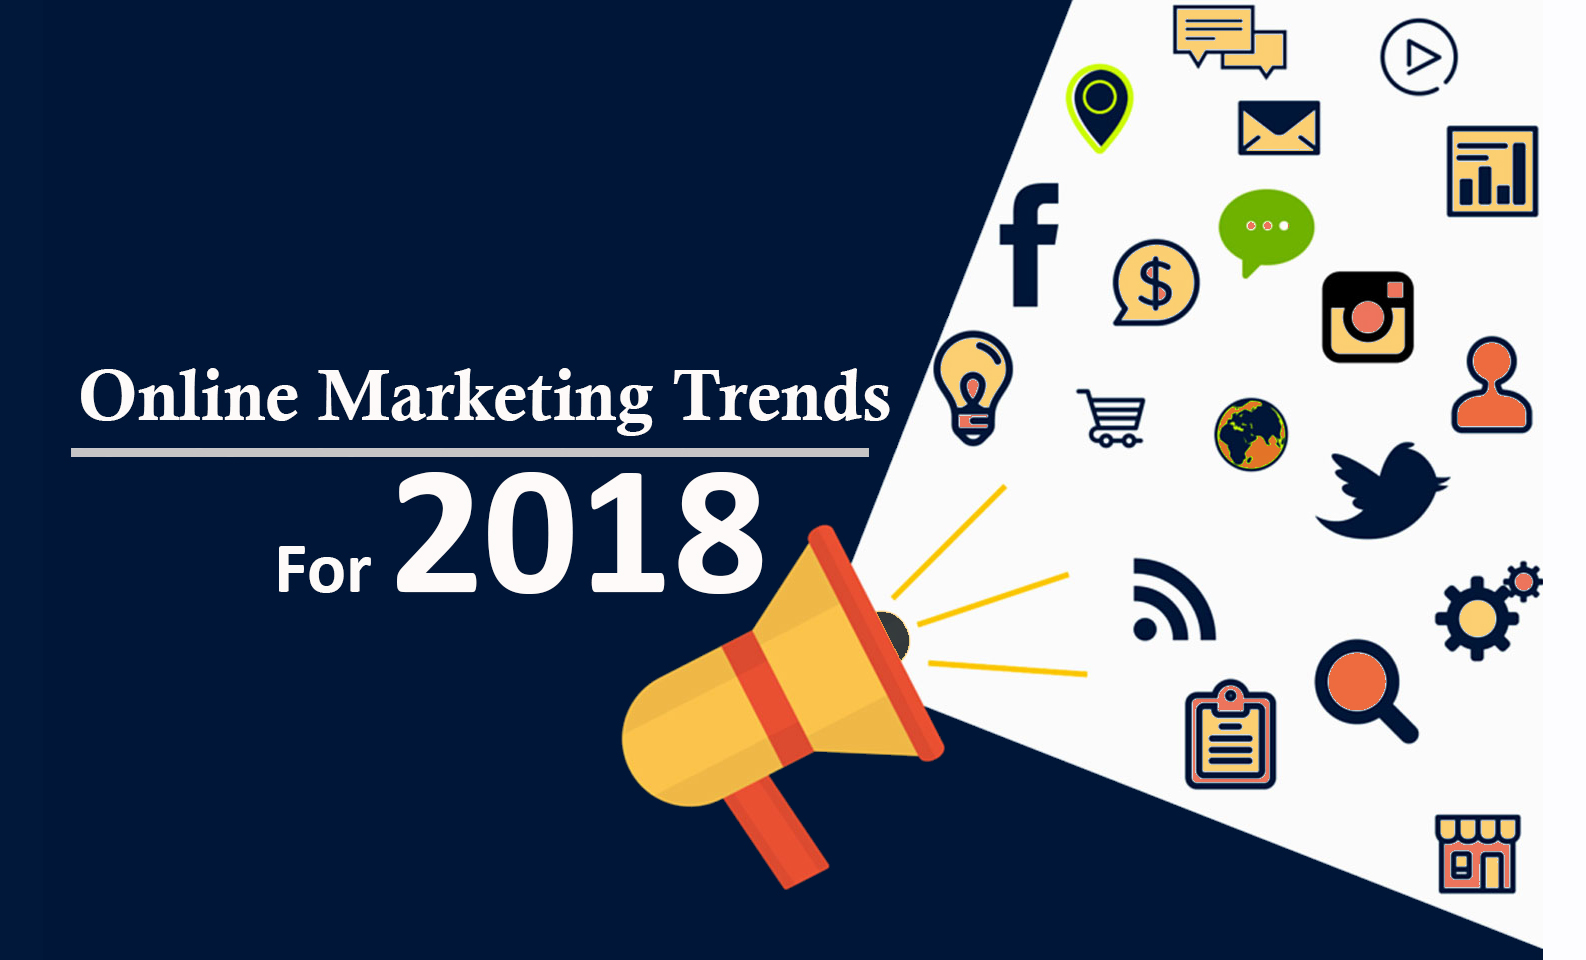 Online Marketing Trends & Strategies For 2018